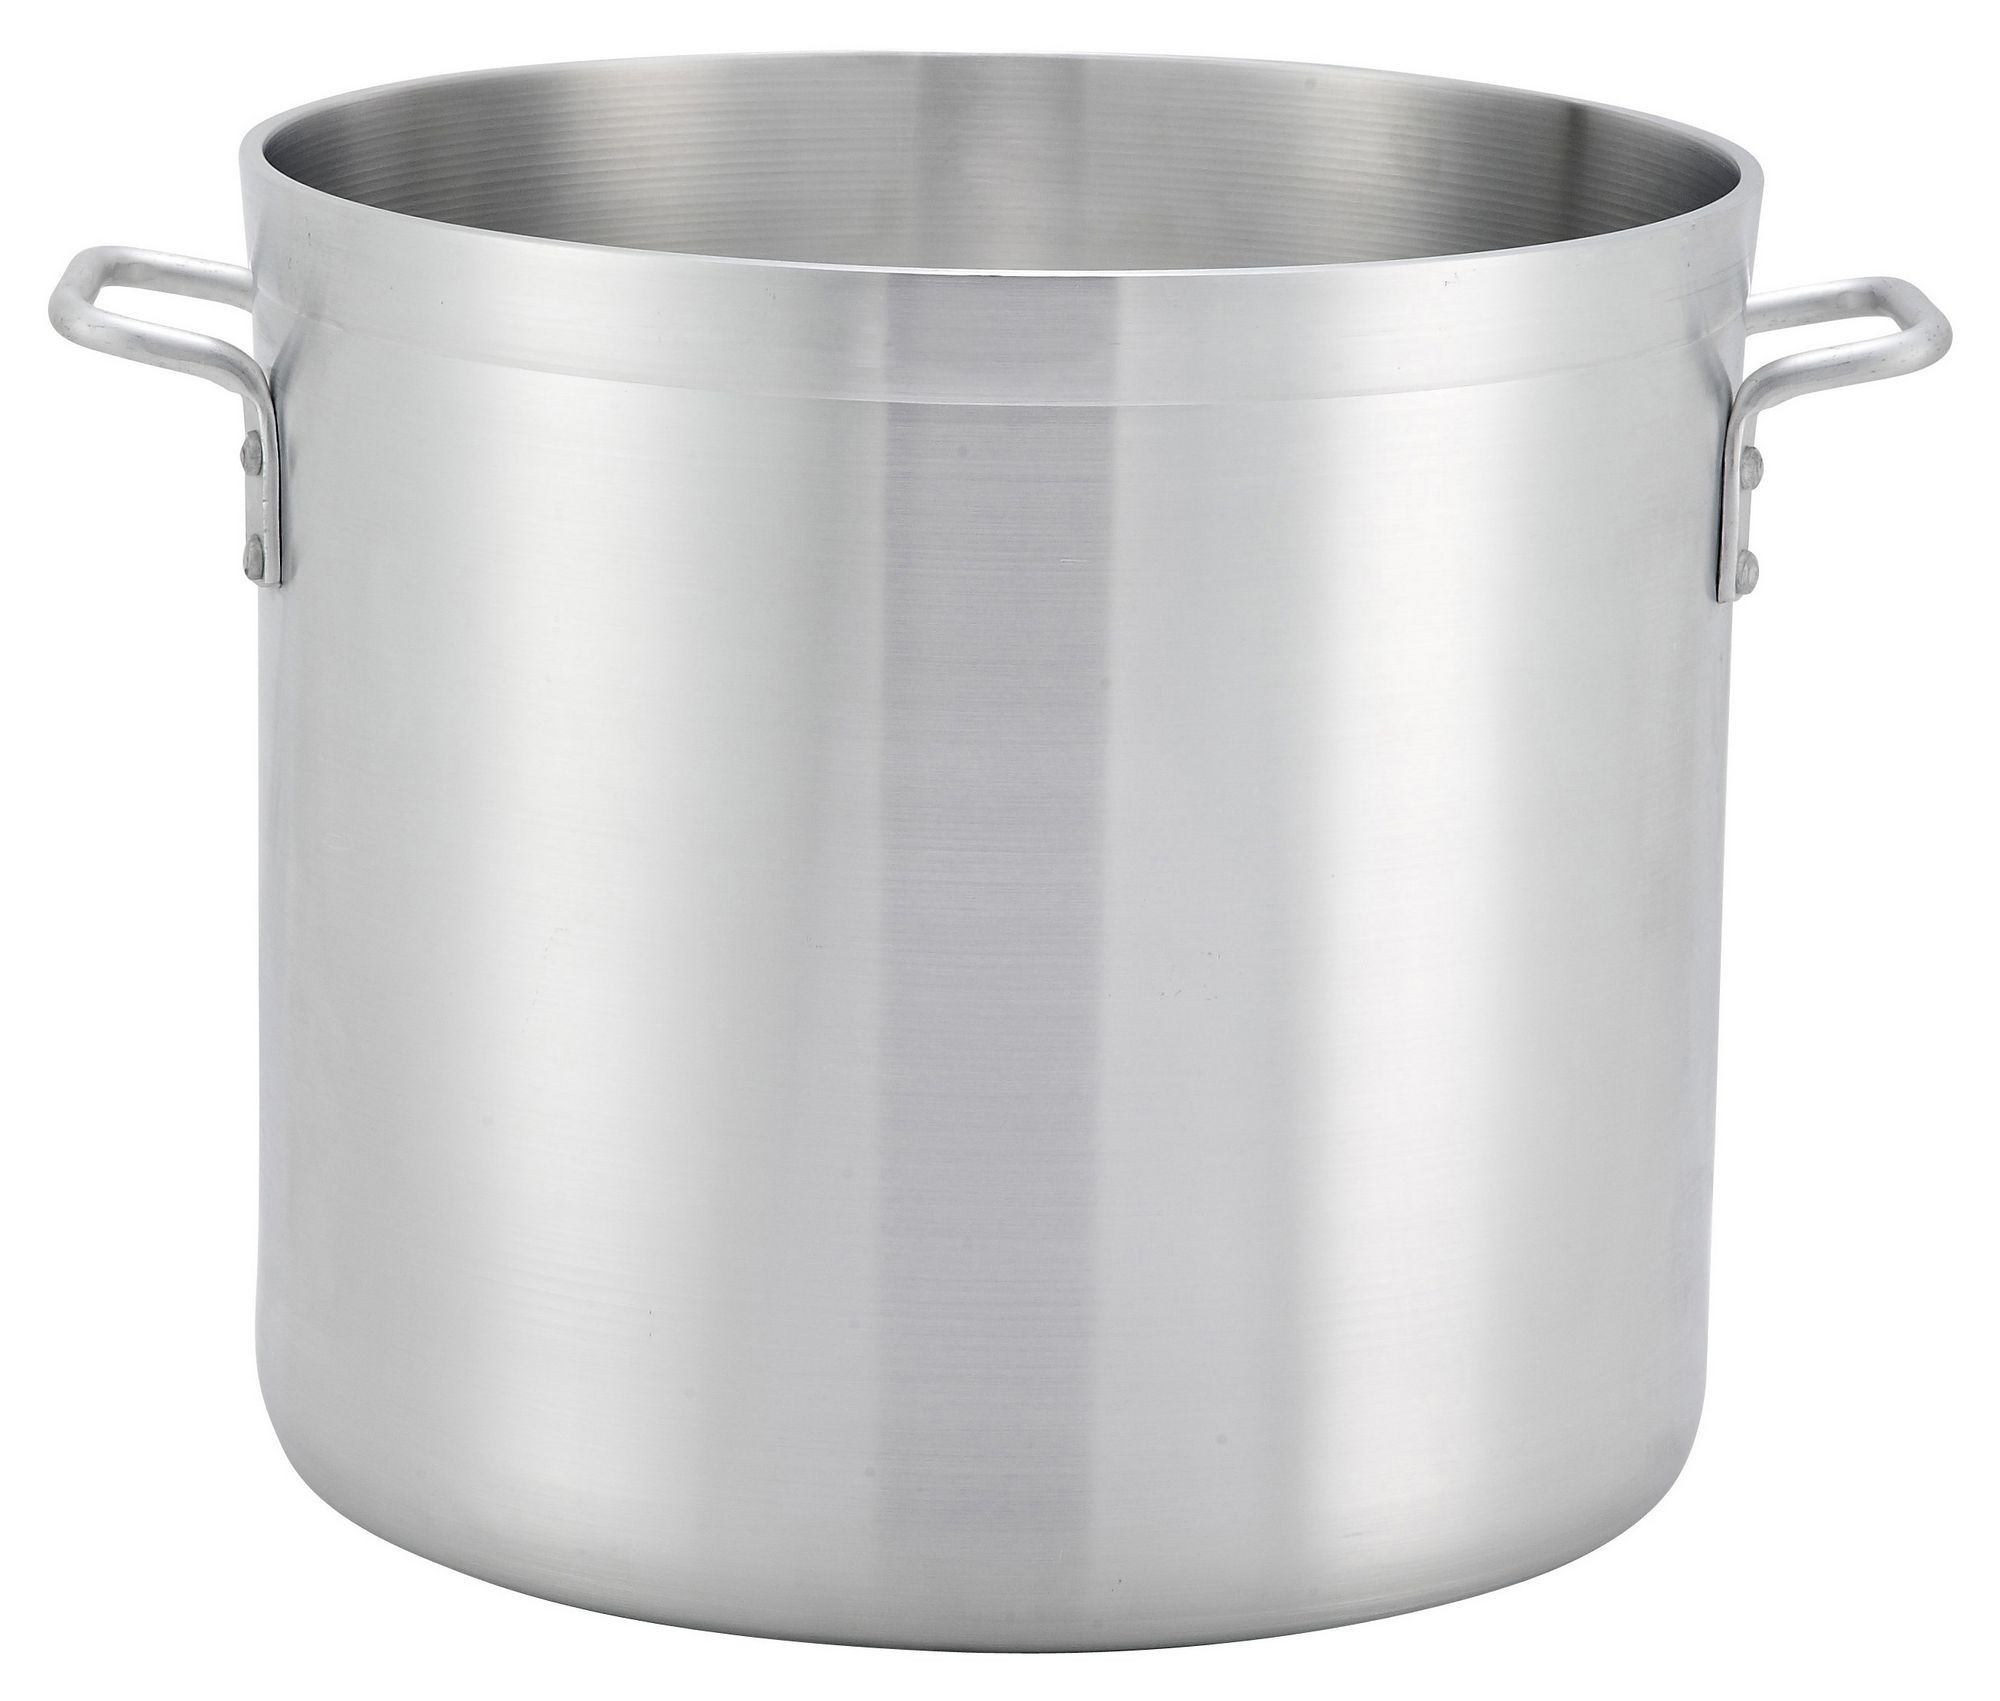 Winco ALHP-120 Precision Aluminum 120 Qt. Stock Pot